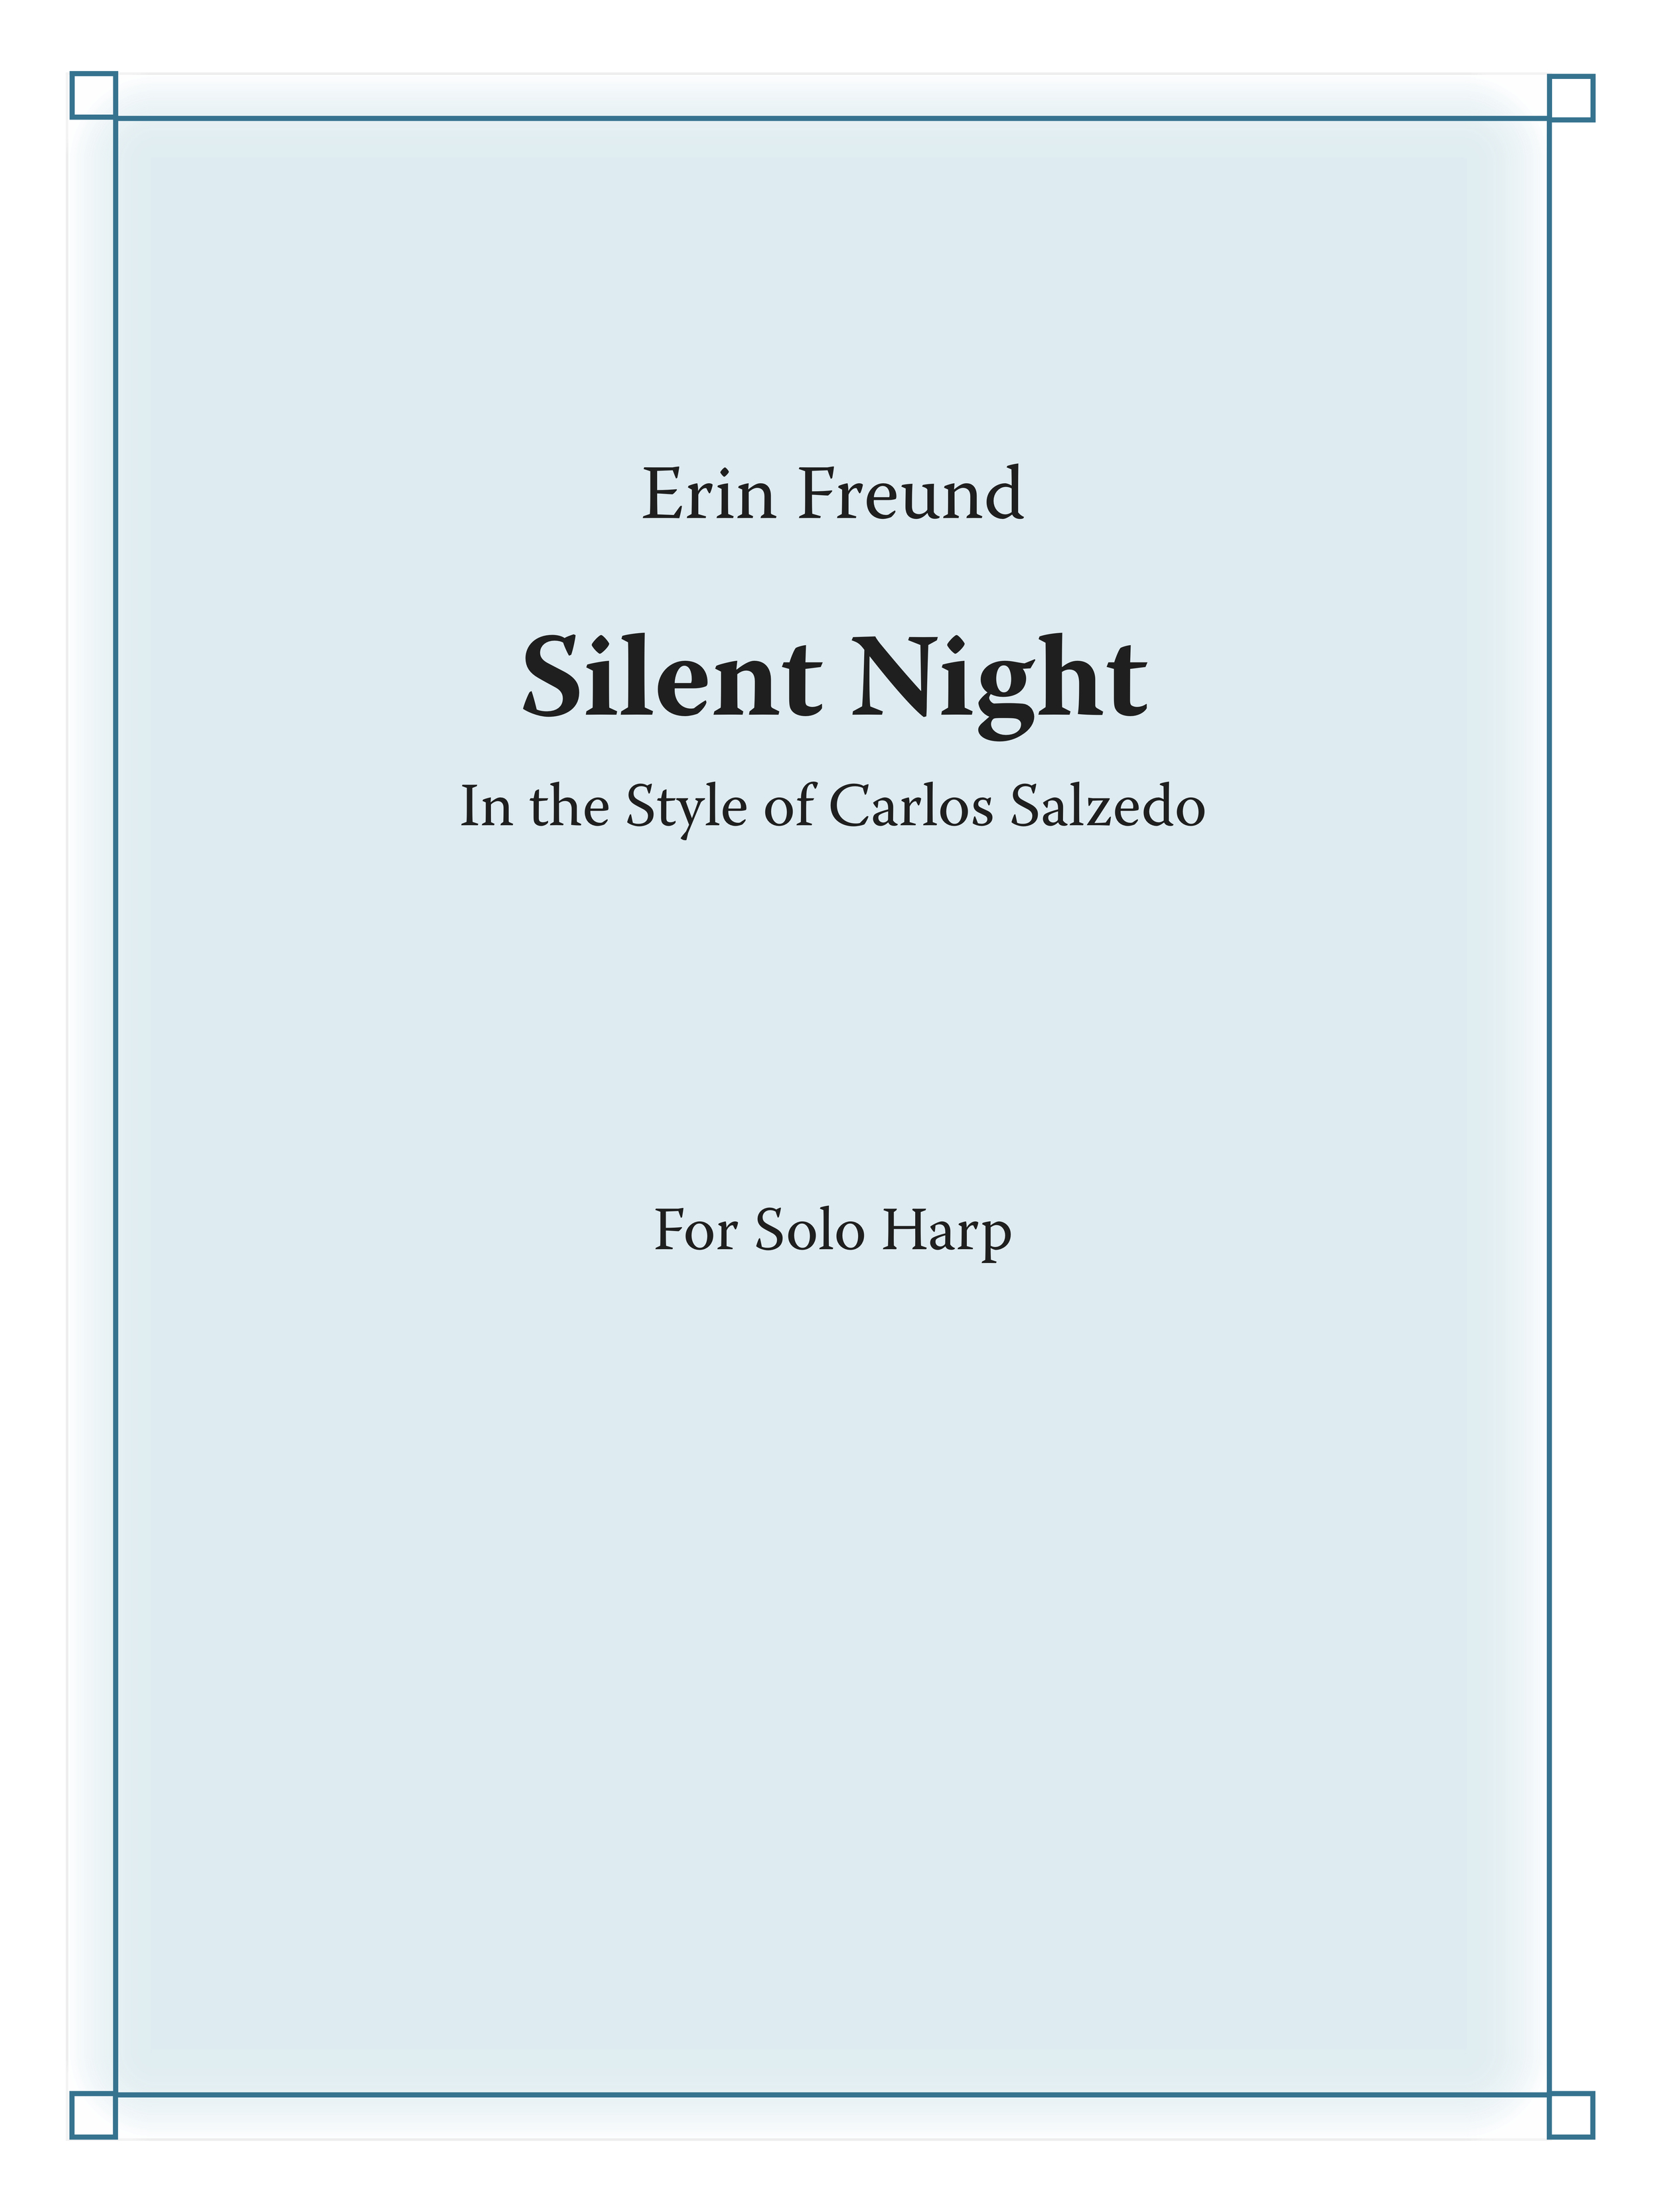 Silent Night page 1.jpg